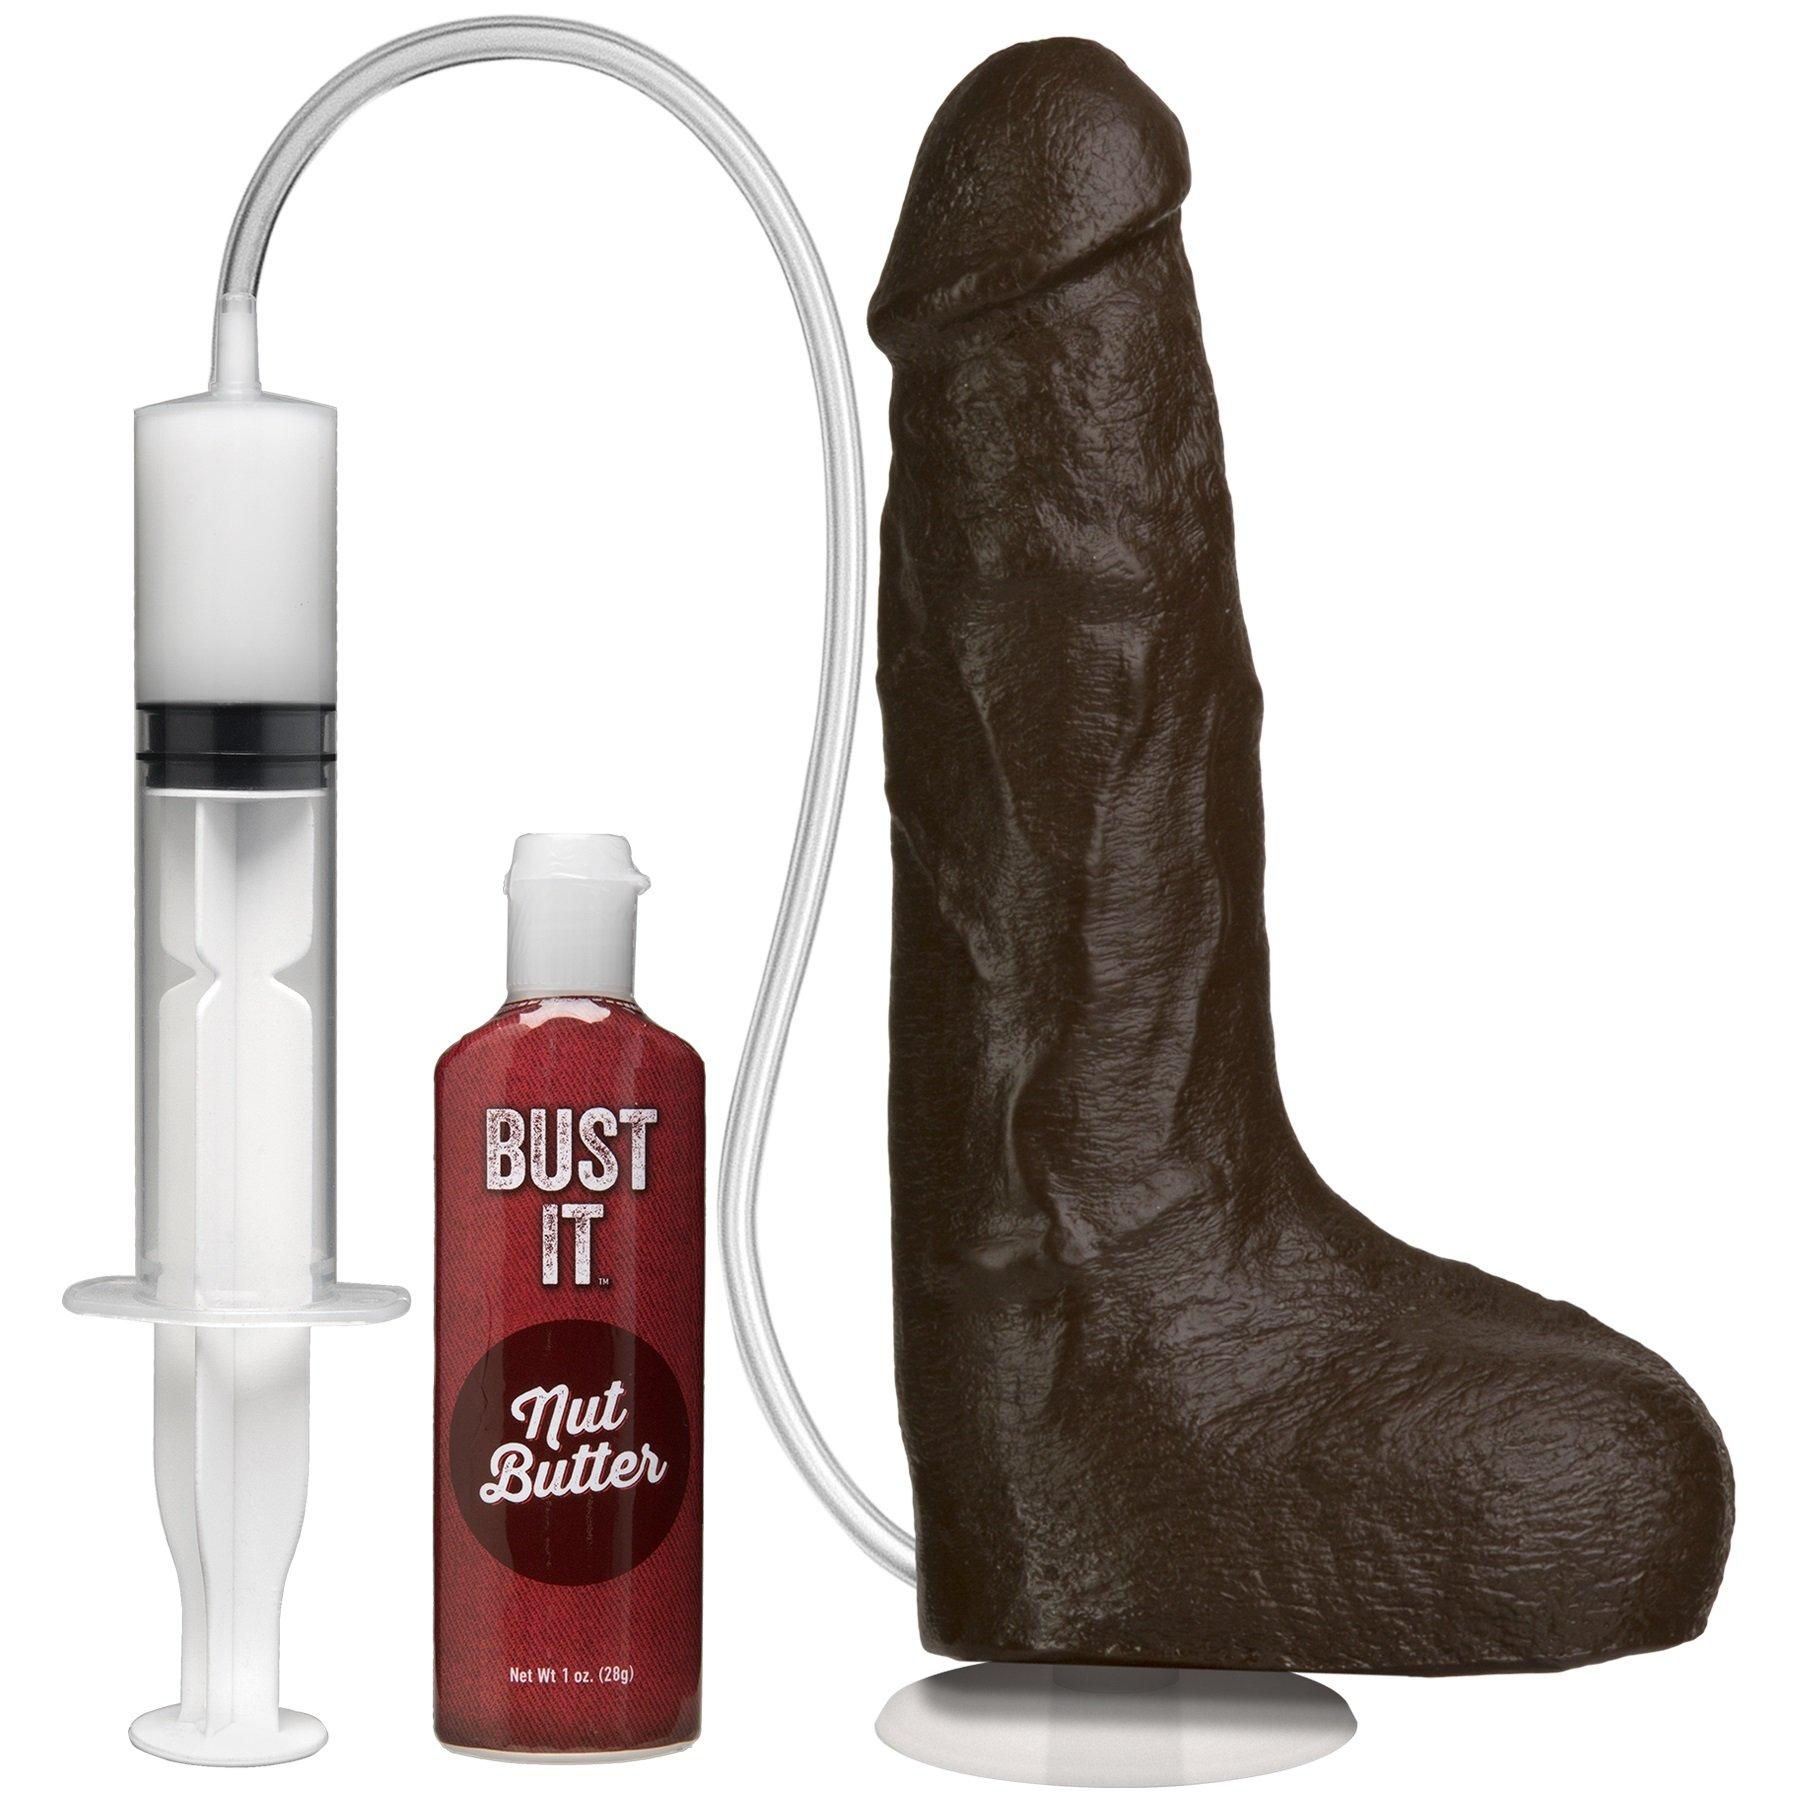 Fake cock send bottle